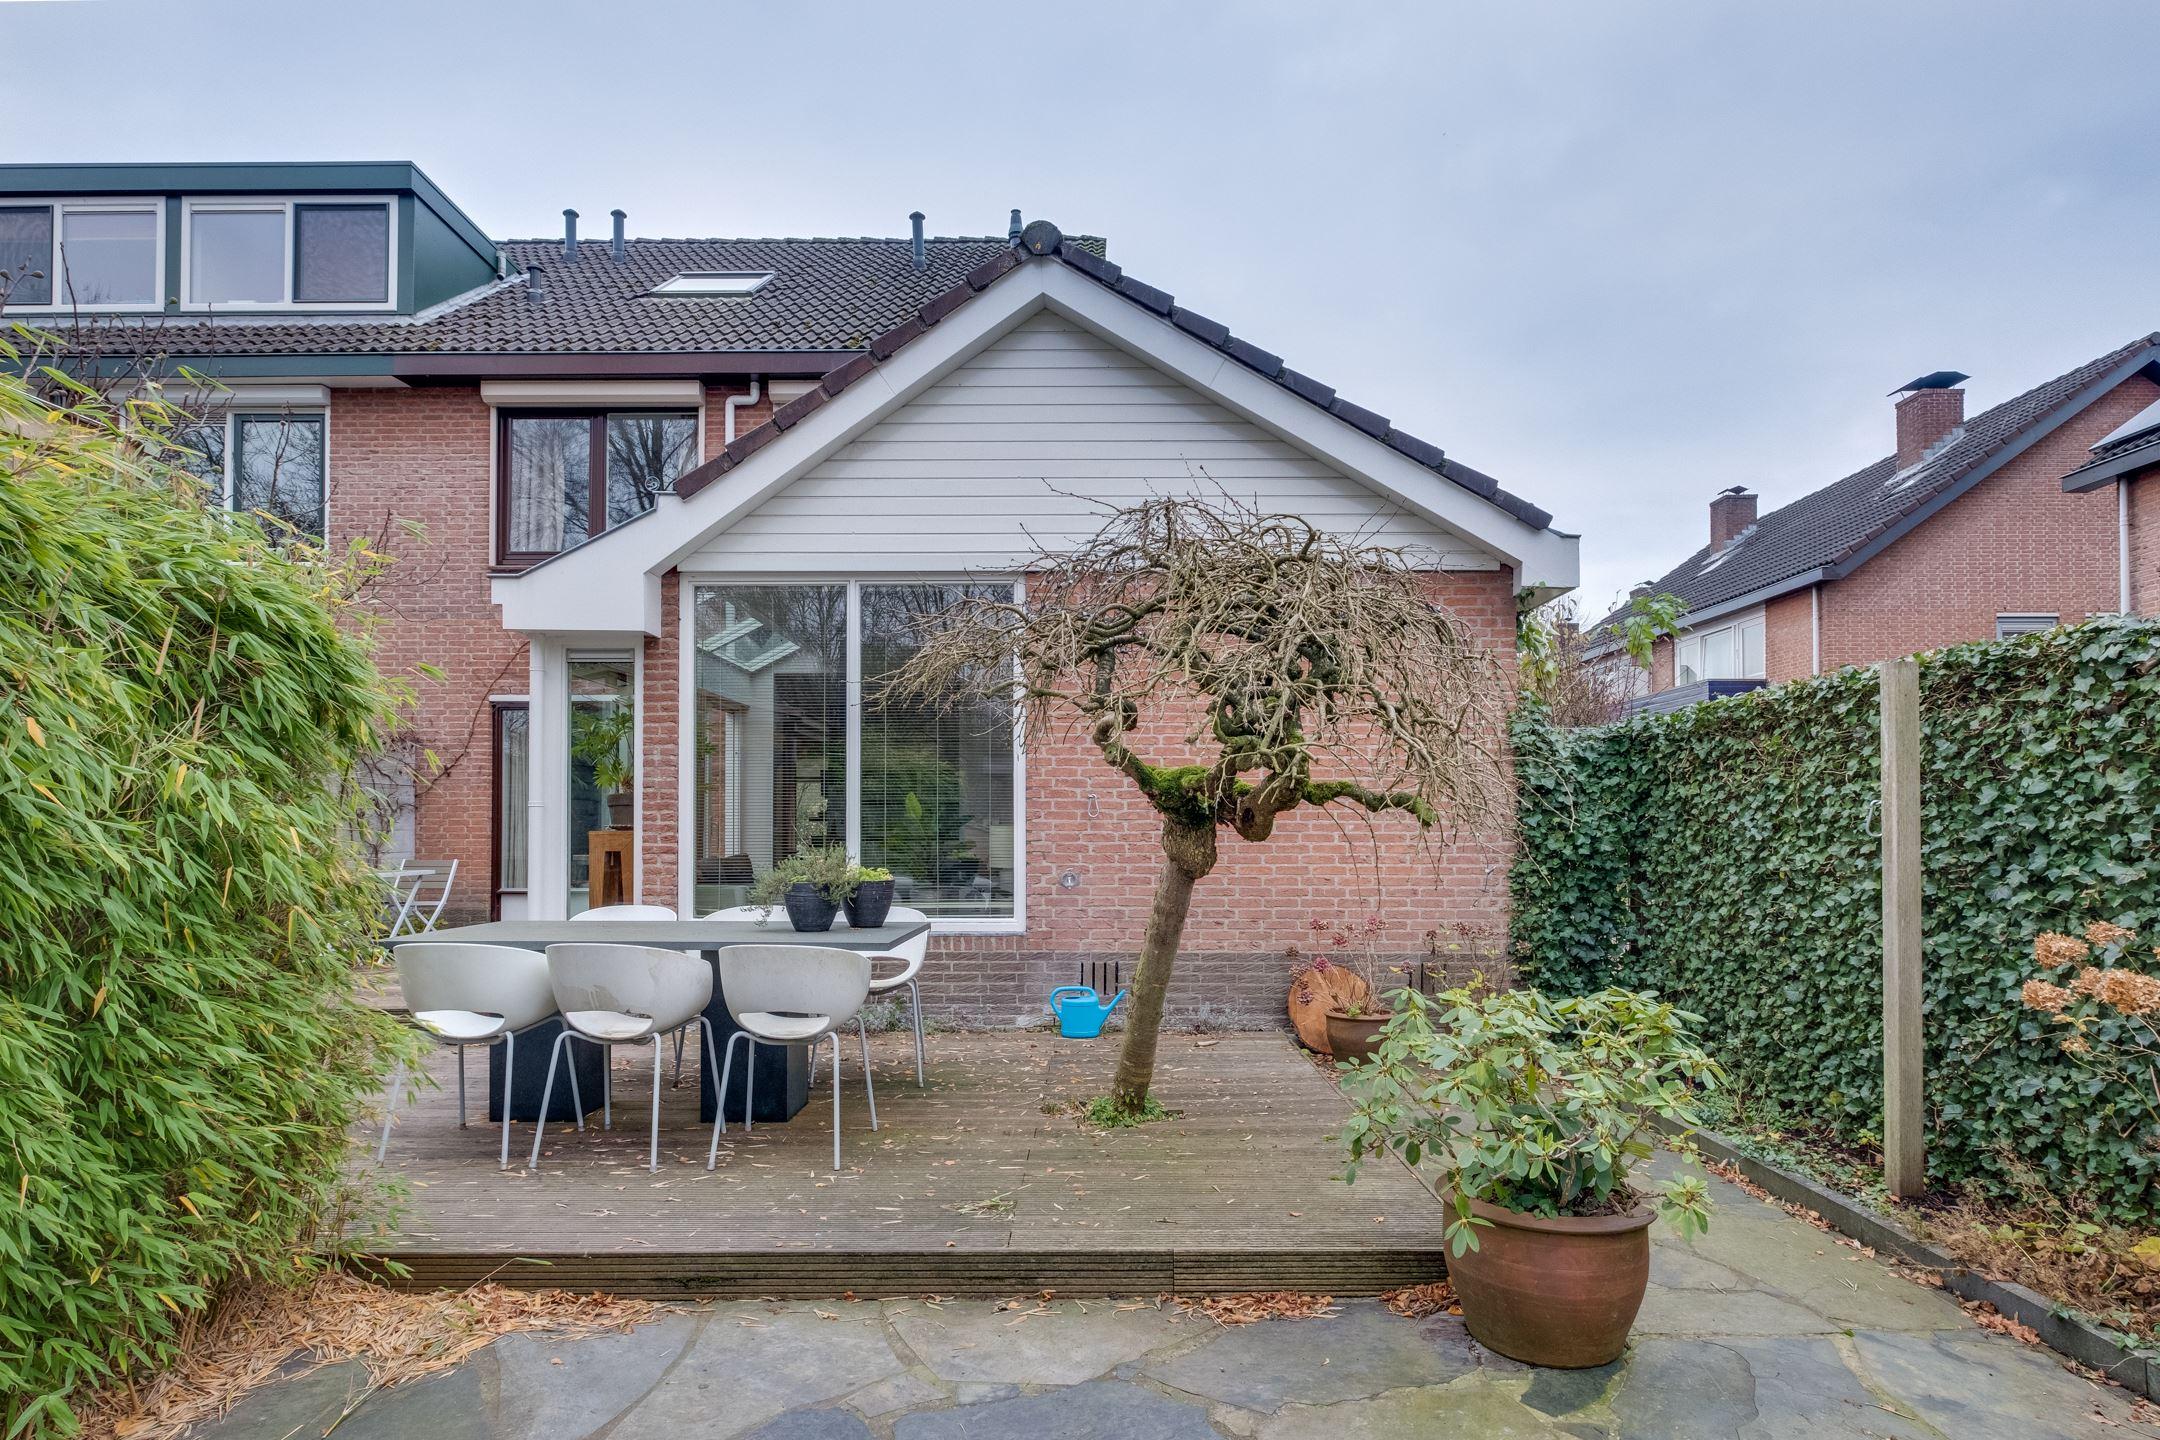 Huis te koop weerdslag 37 7206 bs zutphen funda for Funda zutphen